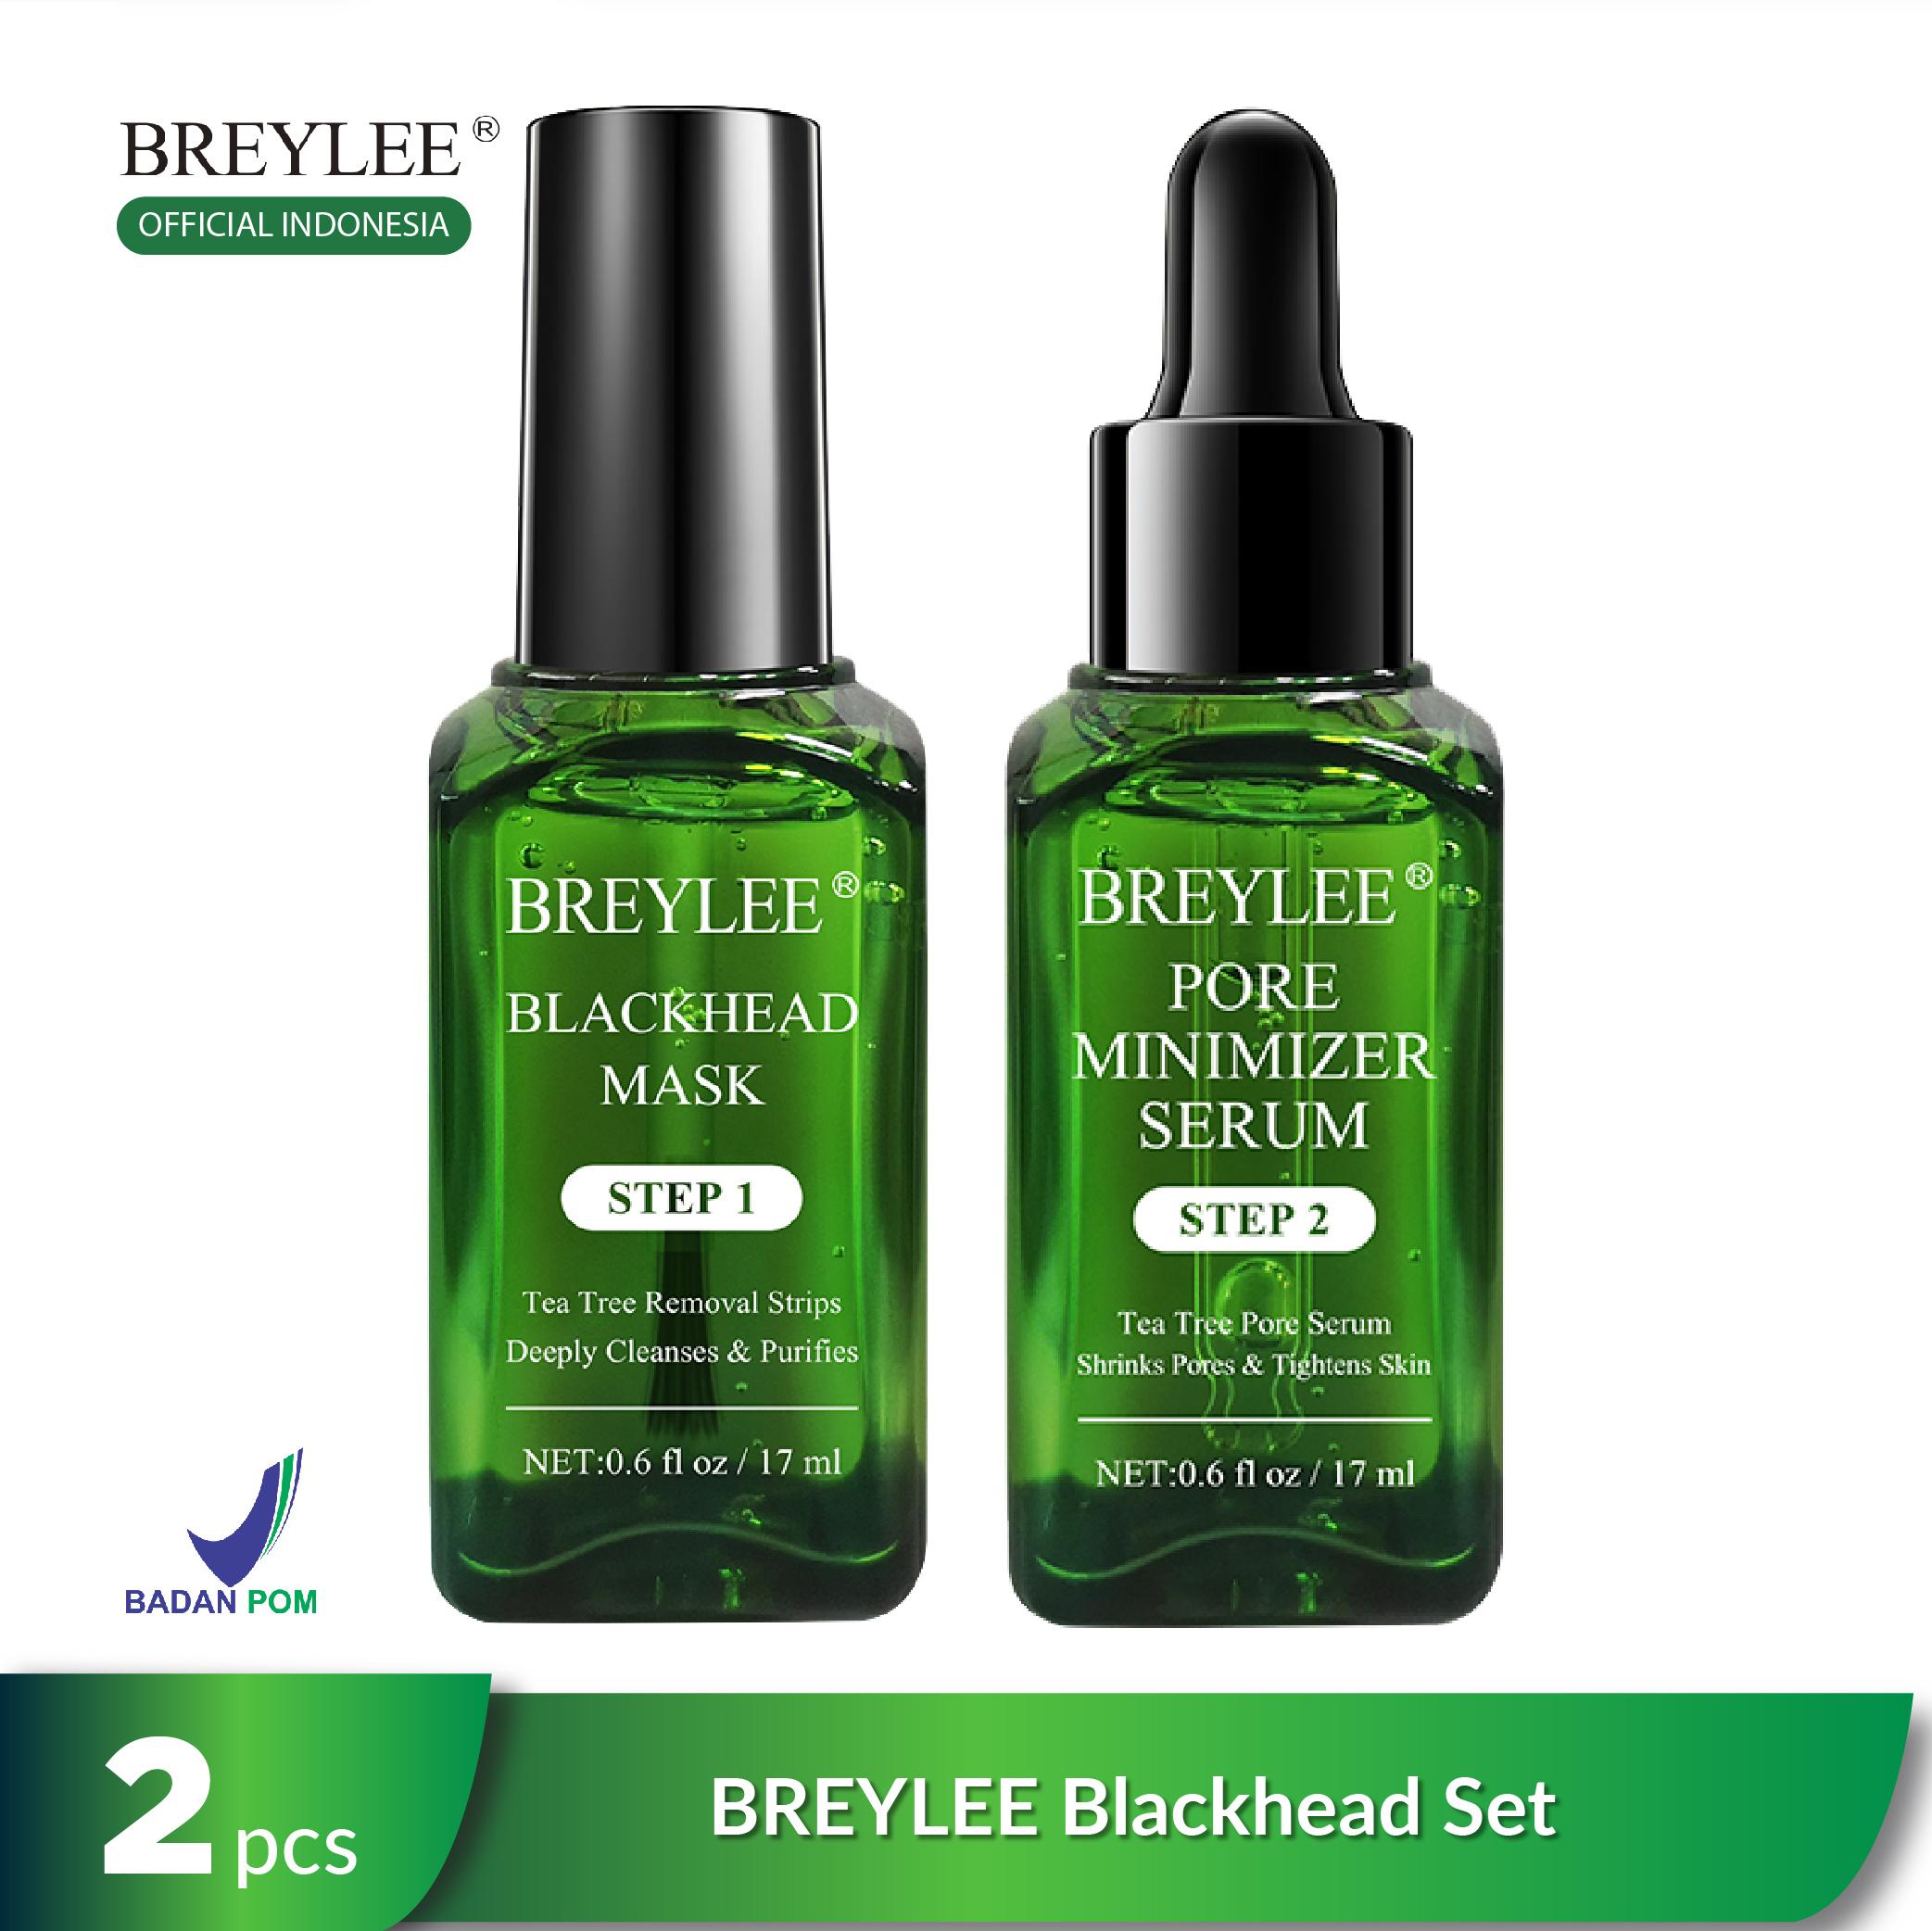 BREYLEE Blackhead Set - Pembersih Komedo & Pengecil Pori-Pori (2pcs) thumbnail